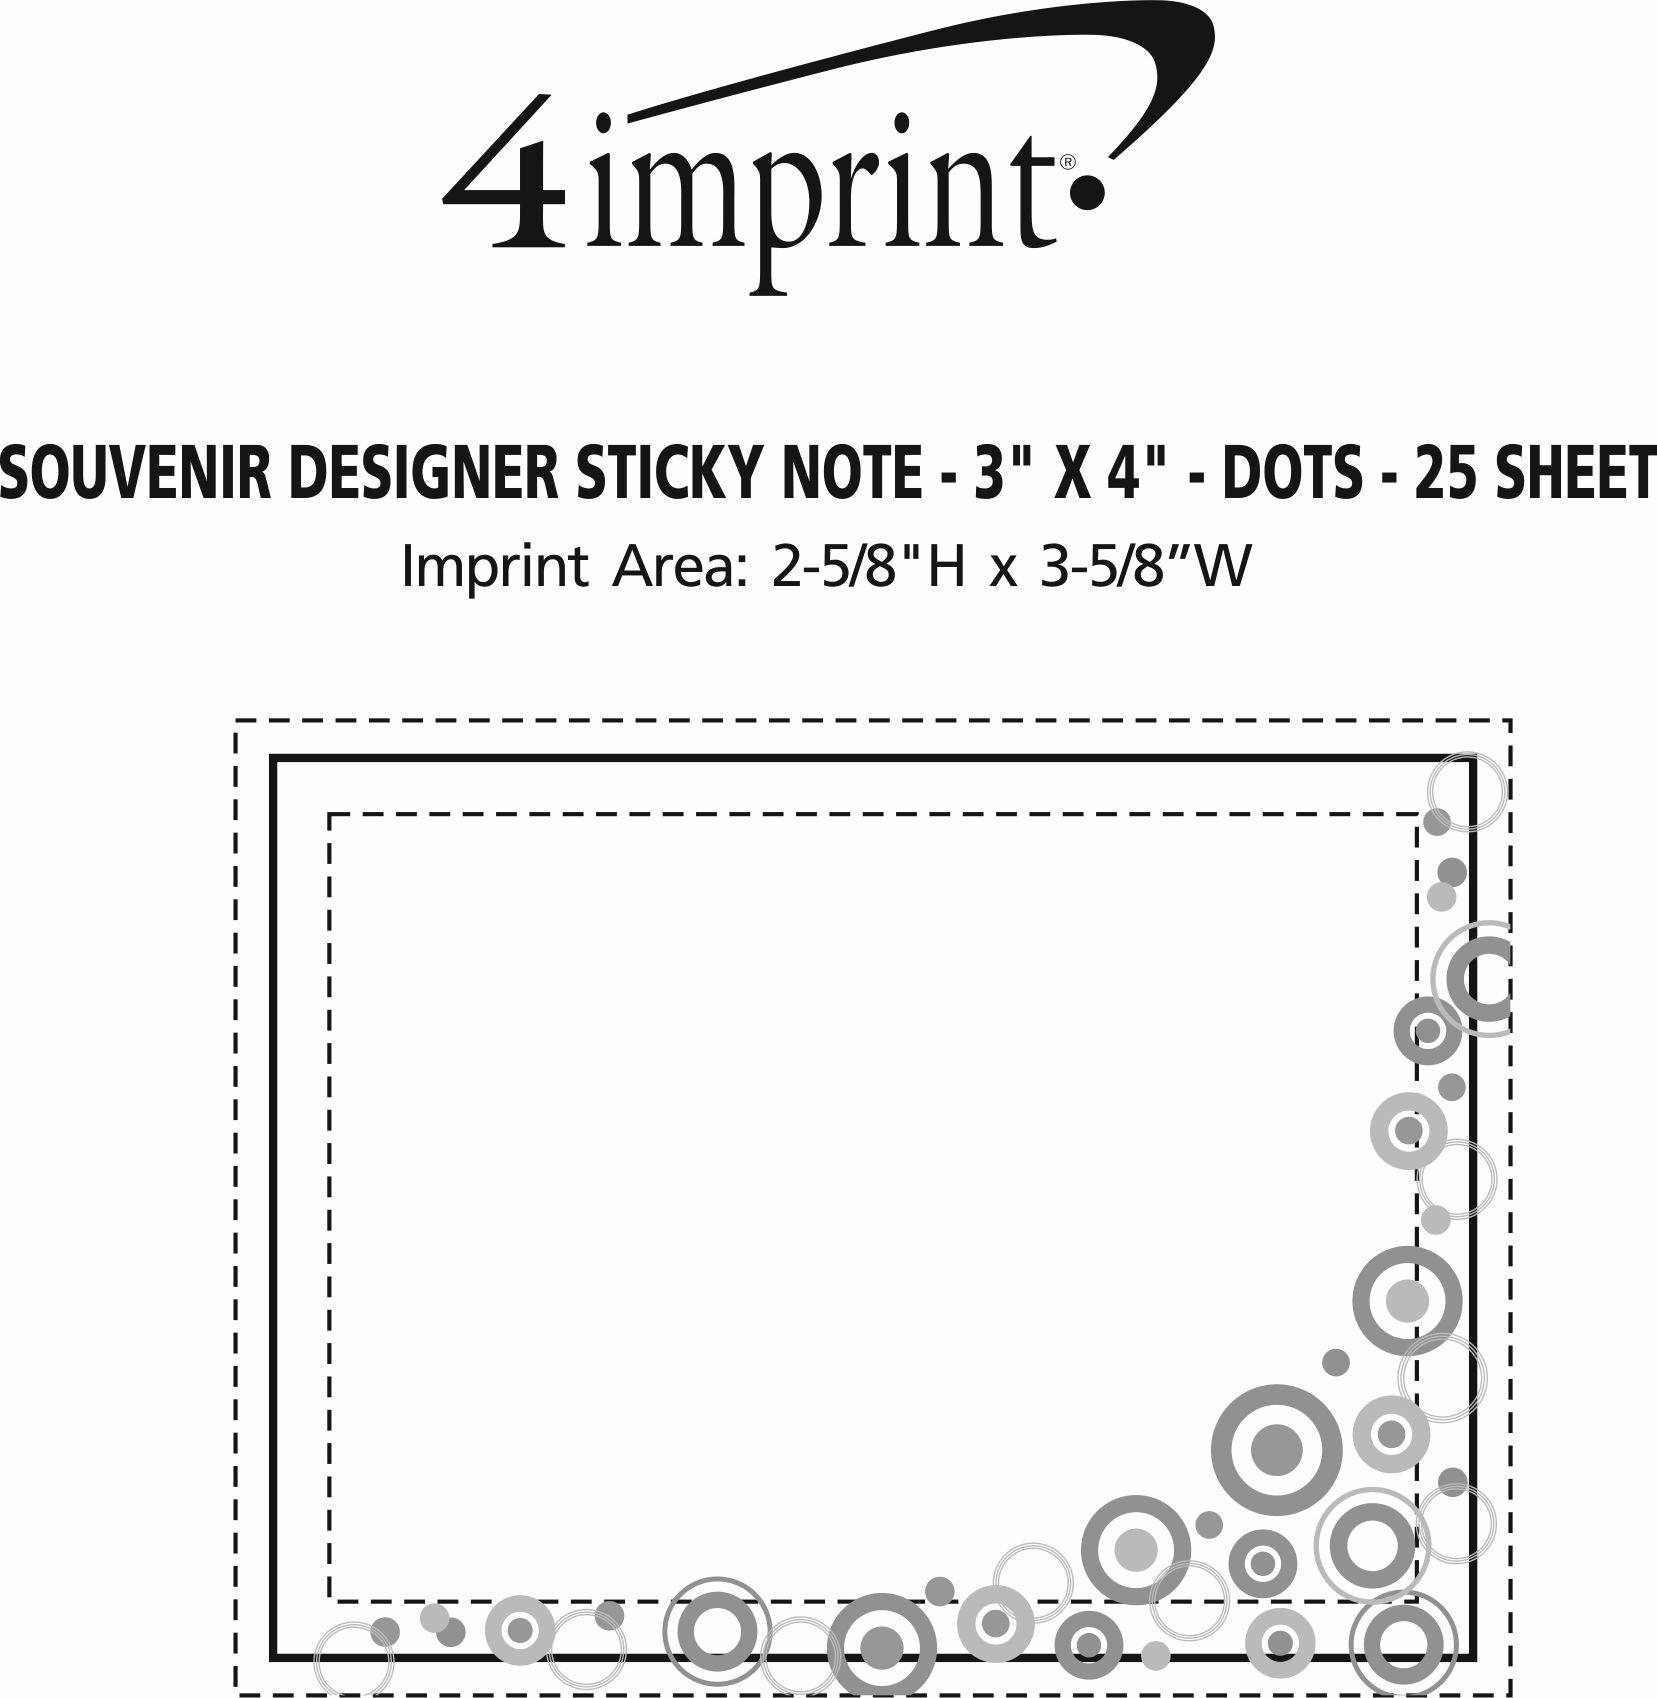 "Imprint Area of Bic Sticky Note - Designer - 3"" x 4"" - Dots - 25 Sheet"